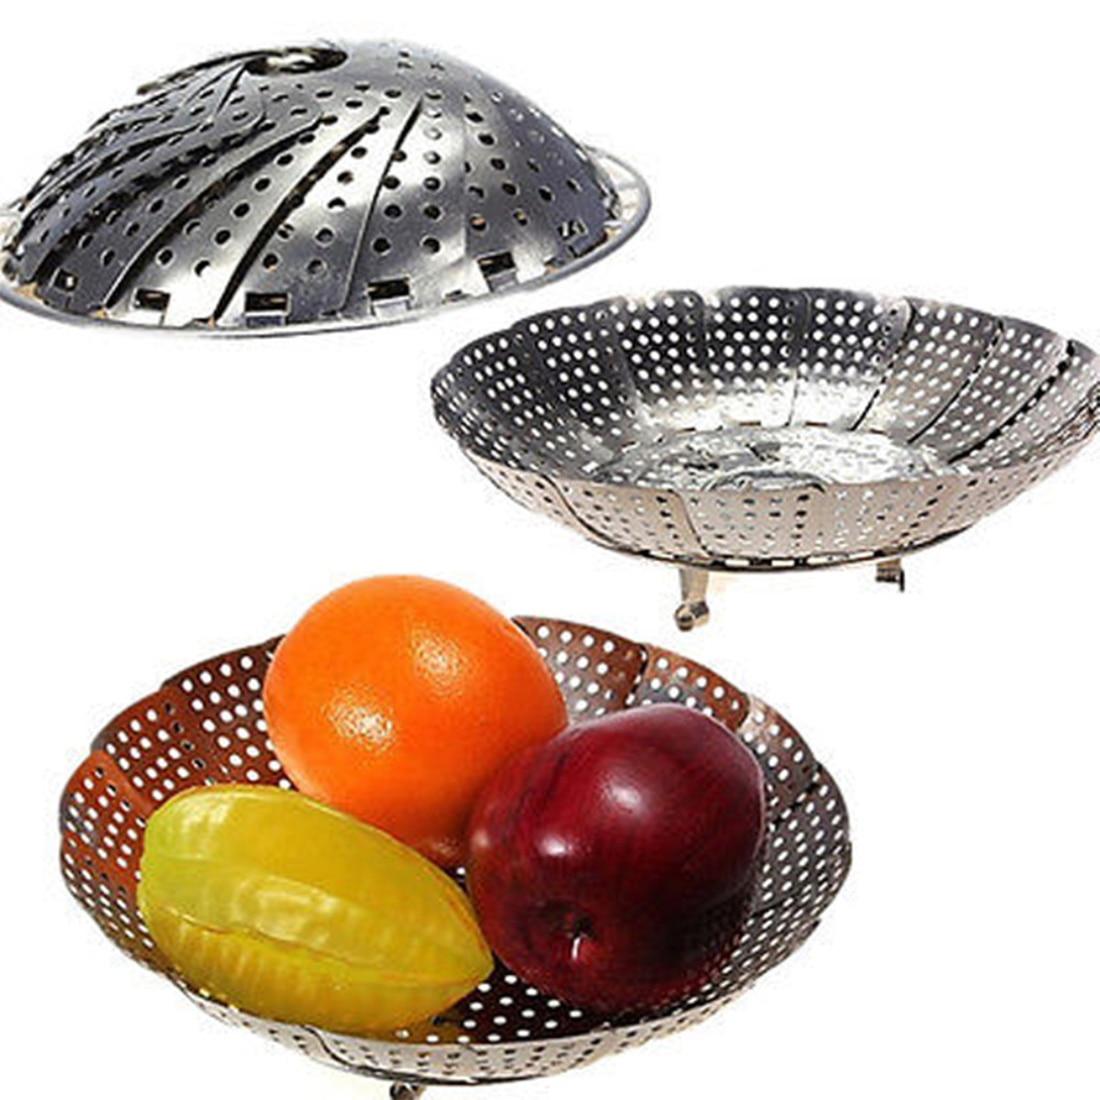 2016 Popular Cookware Stainless Steaming Basket Stainless Steamer Folding Food Fruit Vegetable Dish Steamer